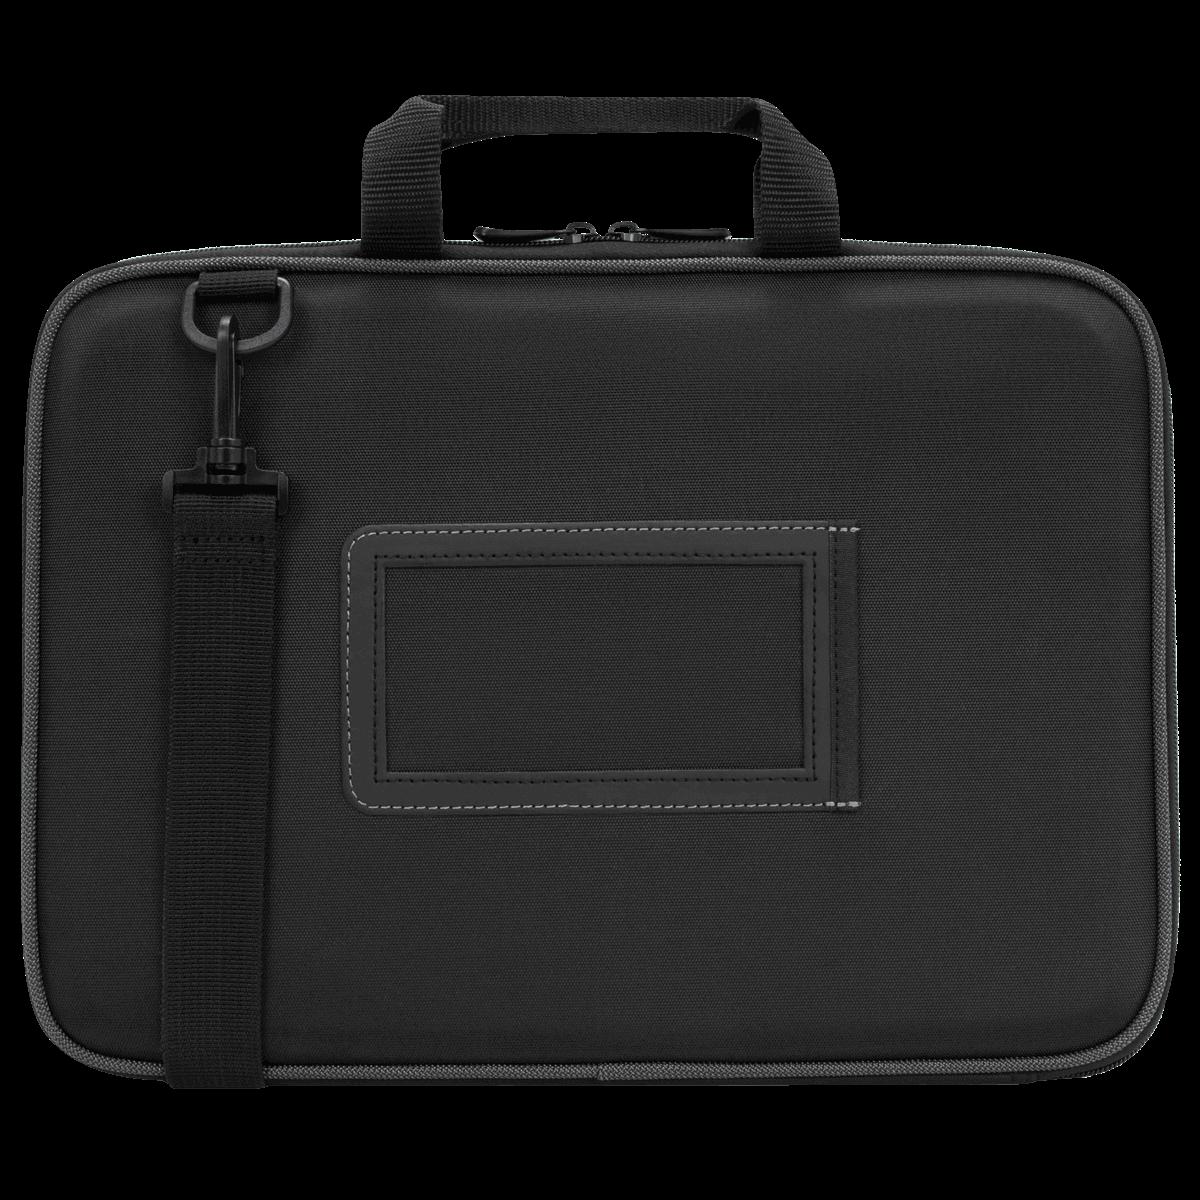 "Targus Chromebook Cases/Sleeves (Sizes 11.6"" & 13/14"") from $7.50"